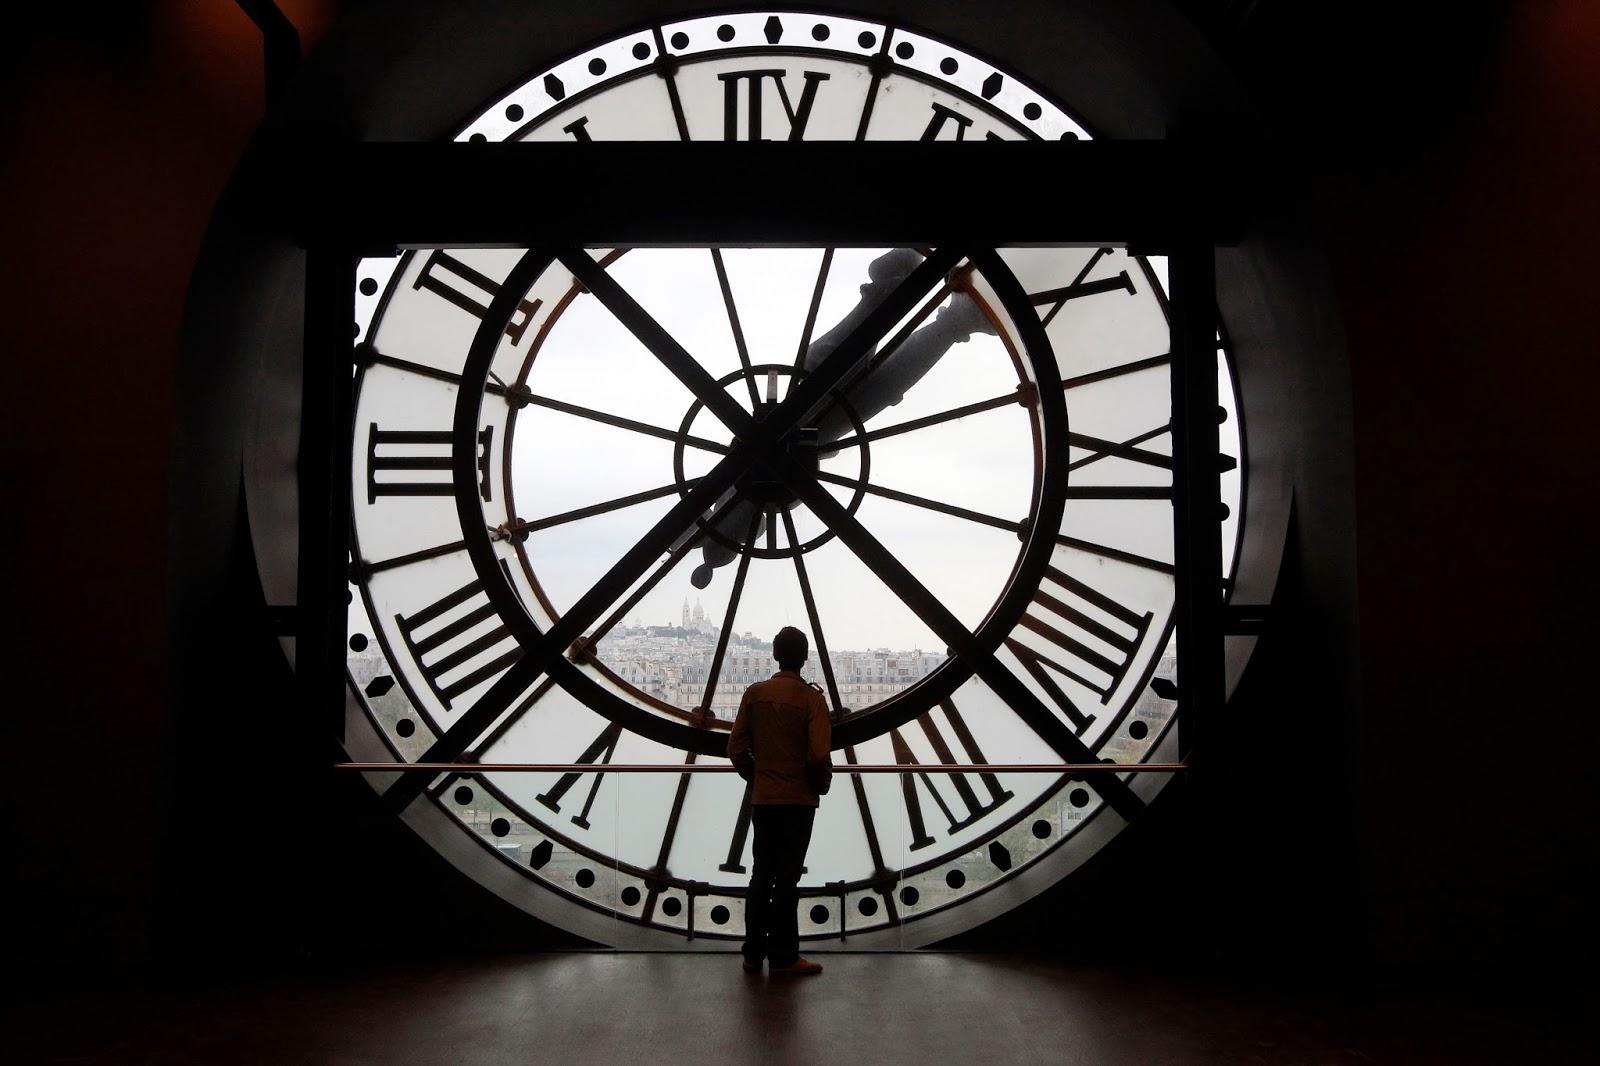 blog féminin, peur de vieillir, assumer son age, madame ou mademoiselle